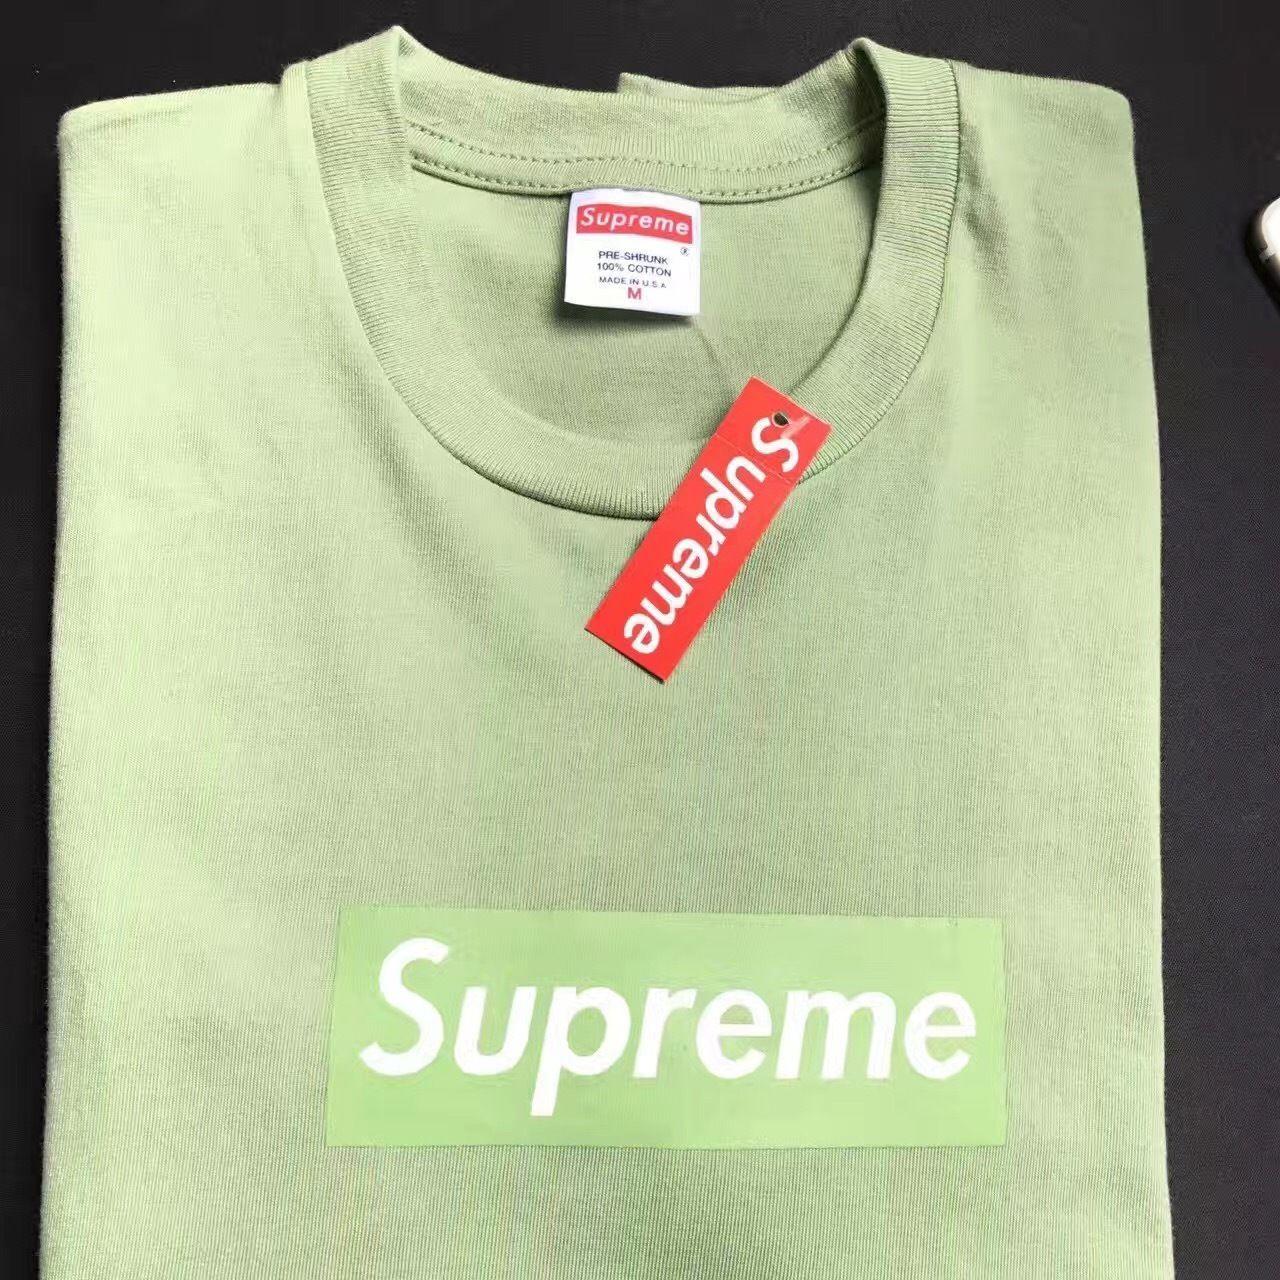 Supreme Box Logo Tshirt Pink Matcha Green Orange Color